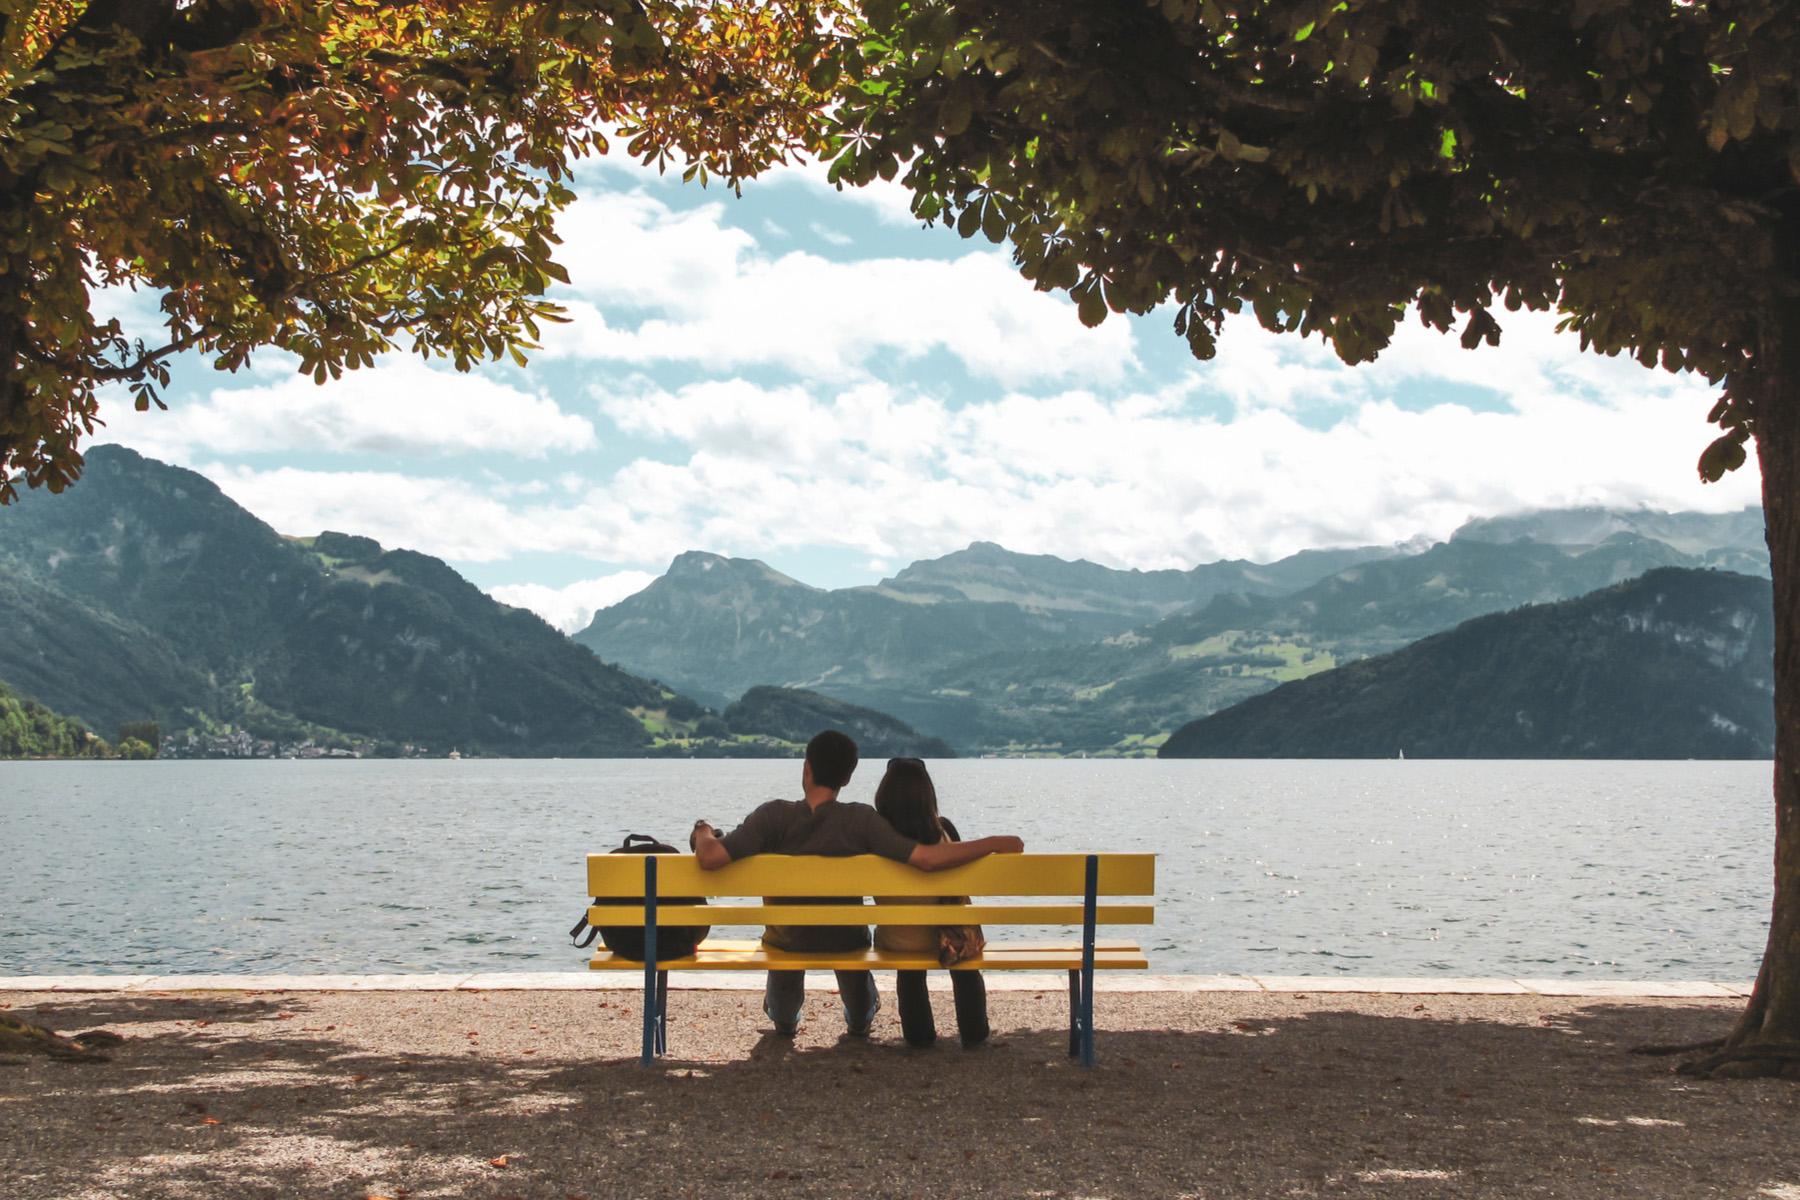 dating vamă în europa